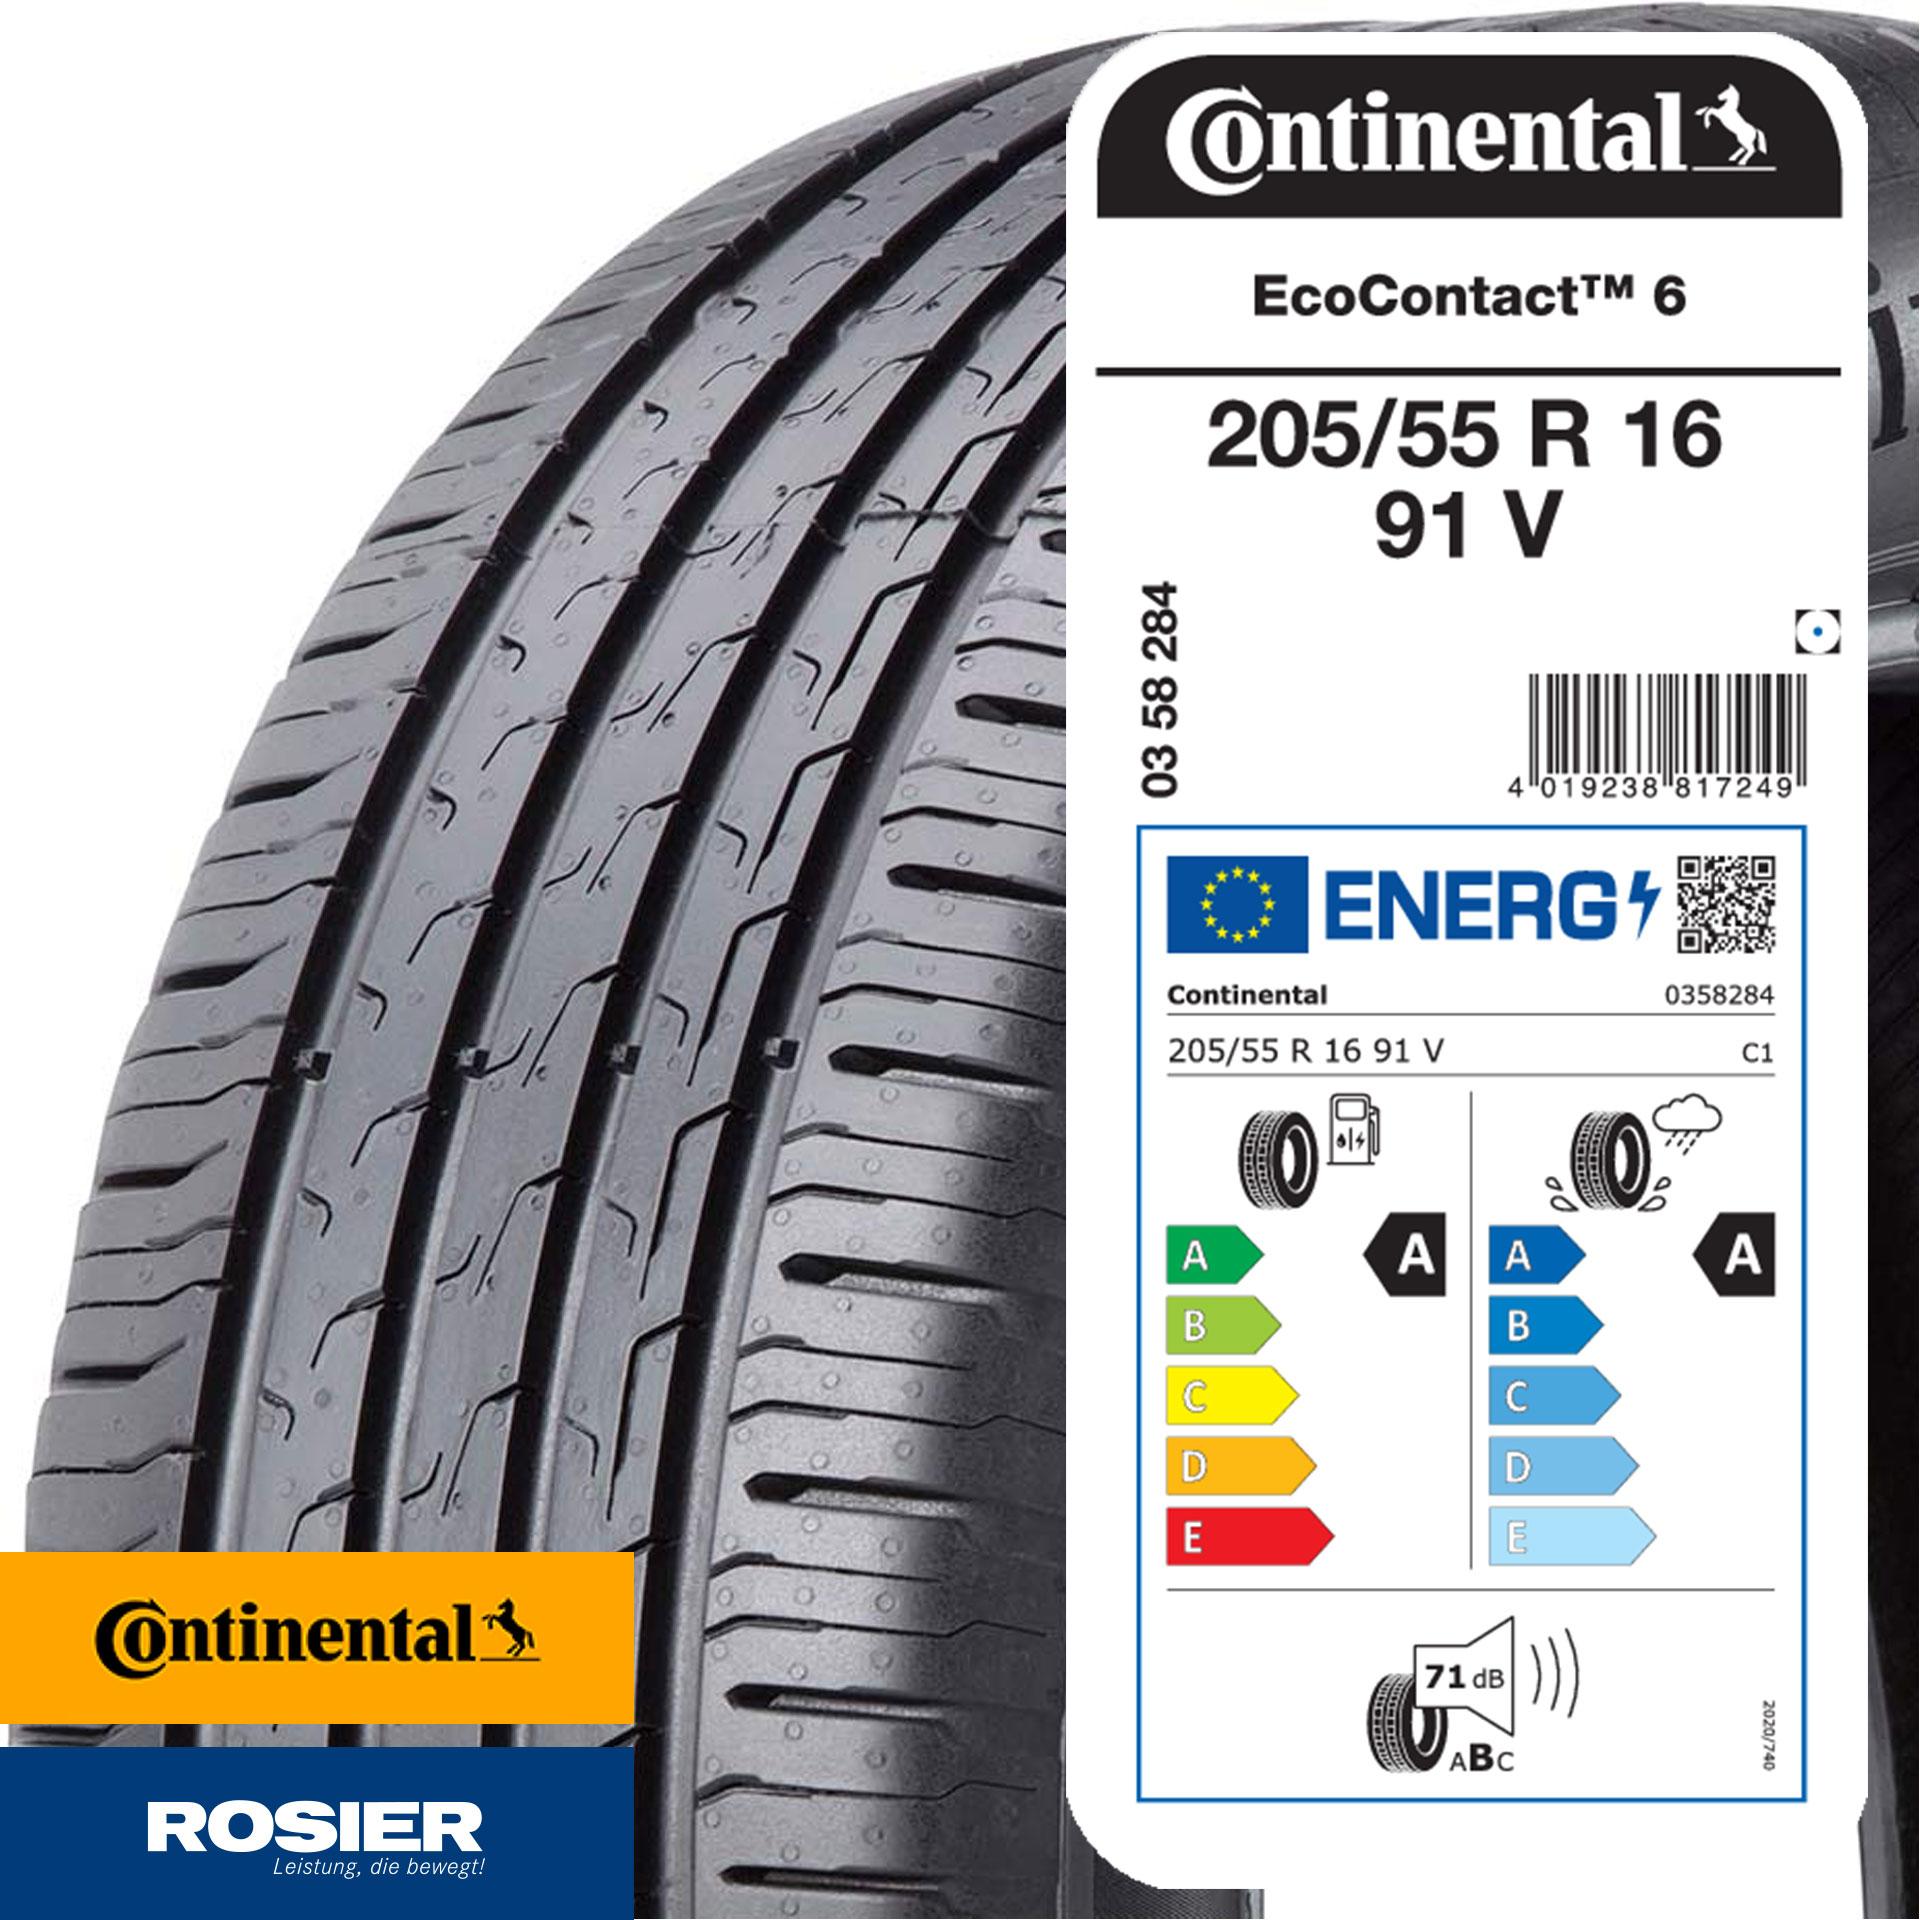 205/55 R16 91V Continental EcoContact 6